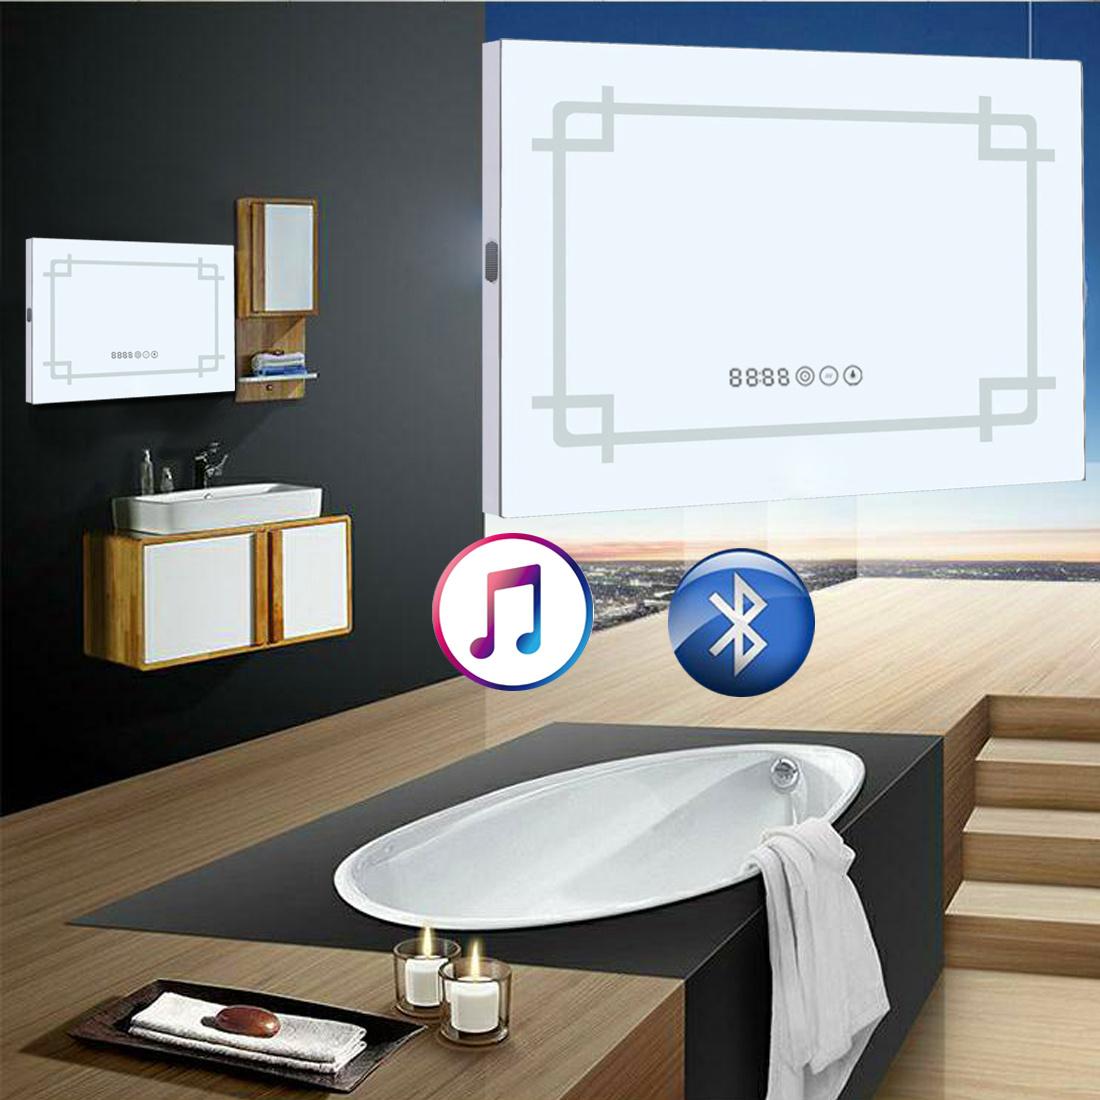 Vanity With Lights And Bluetooth : Wall Mounted LED Light Illuminated Vanity Mirror Bluetooth Speaker Sensor Socket eBay